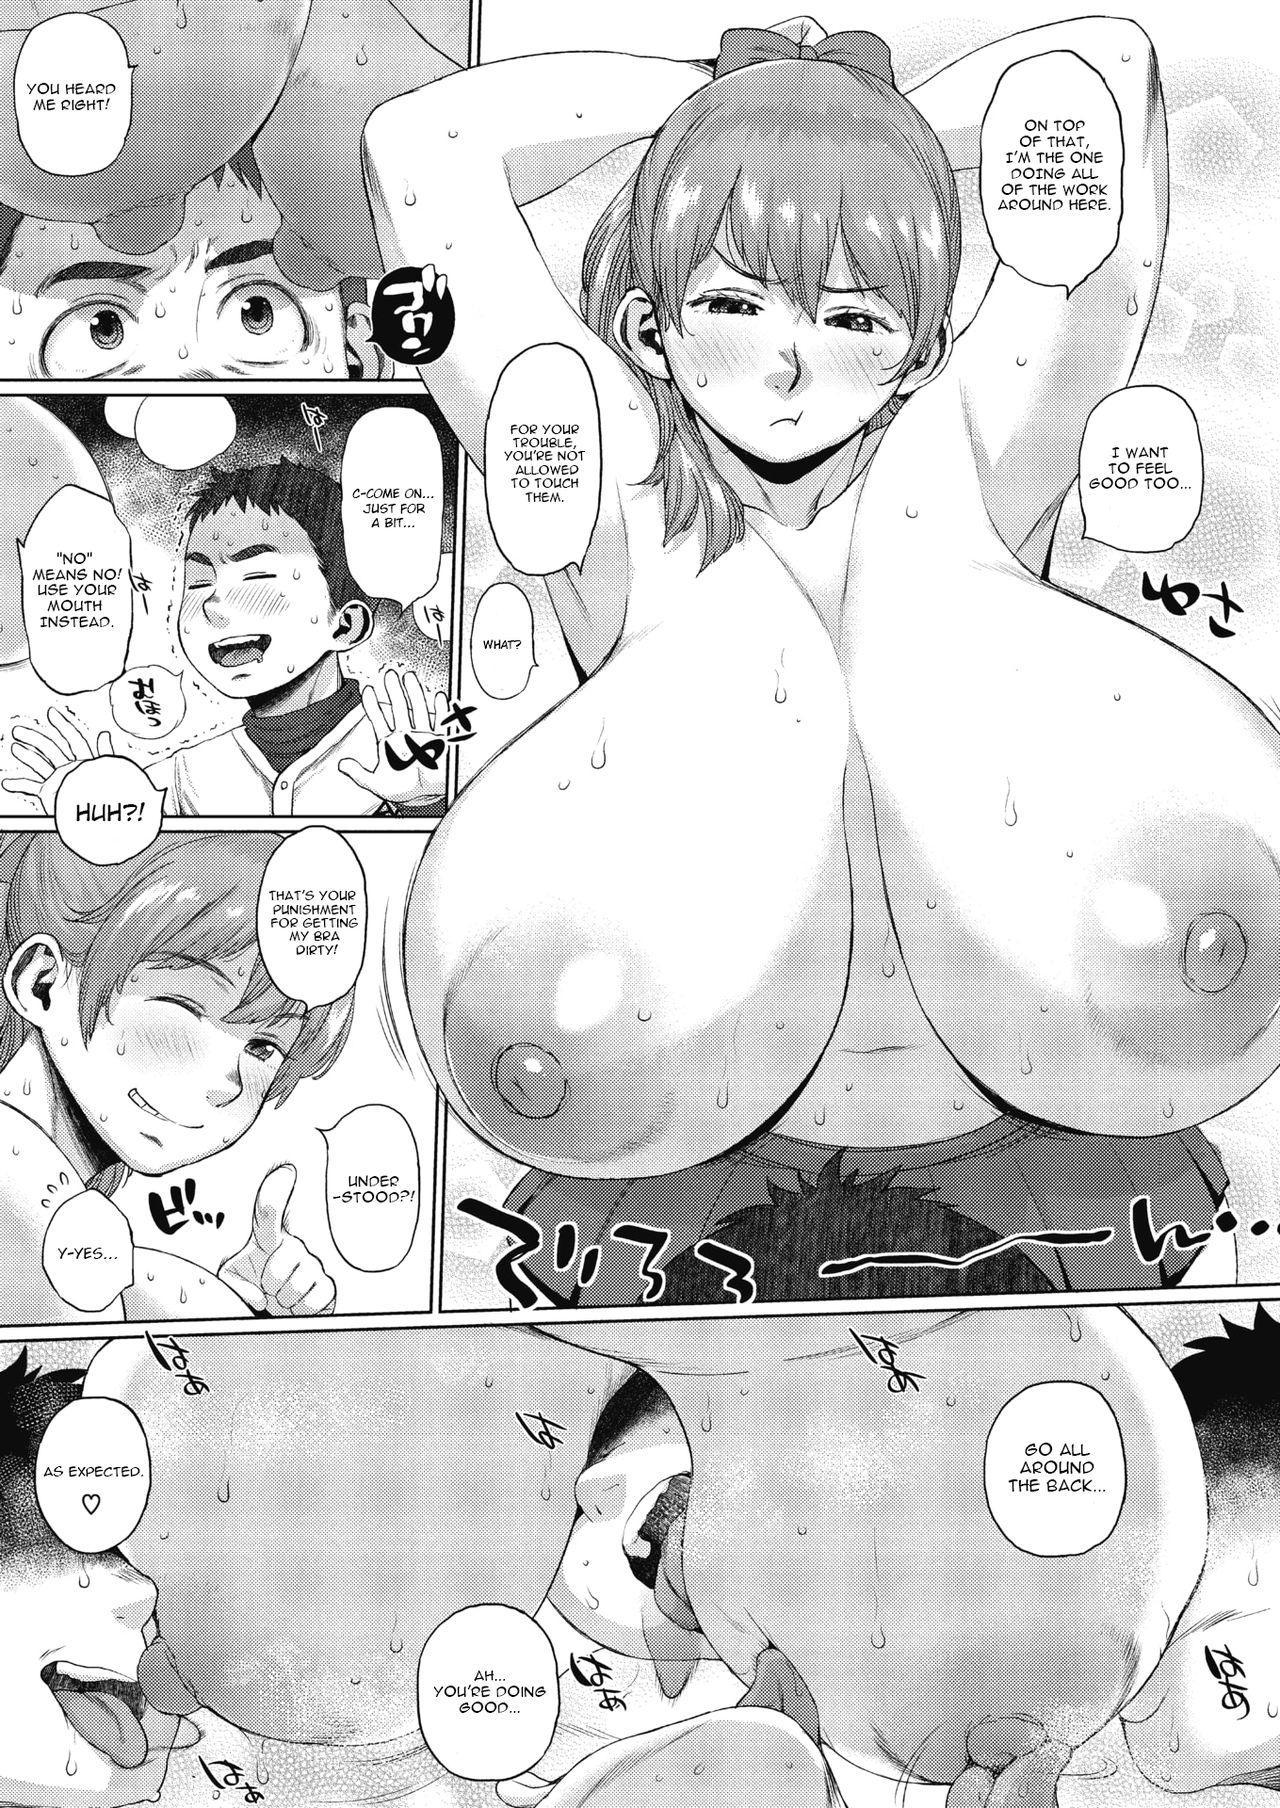 Senpai! Renshū yori honbanssu ♥ | Senpai! From Practice to Action ♥ 10